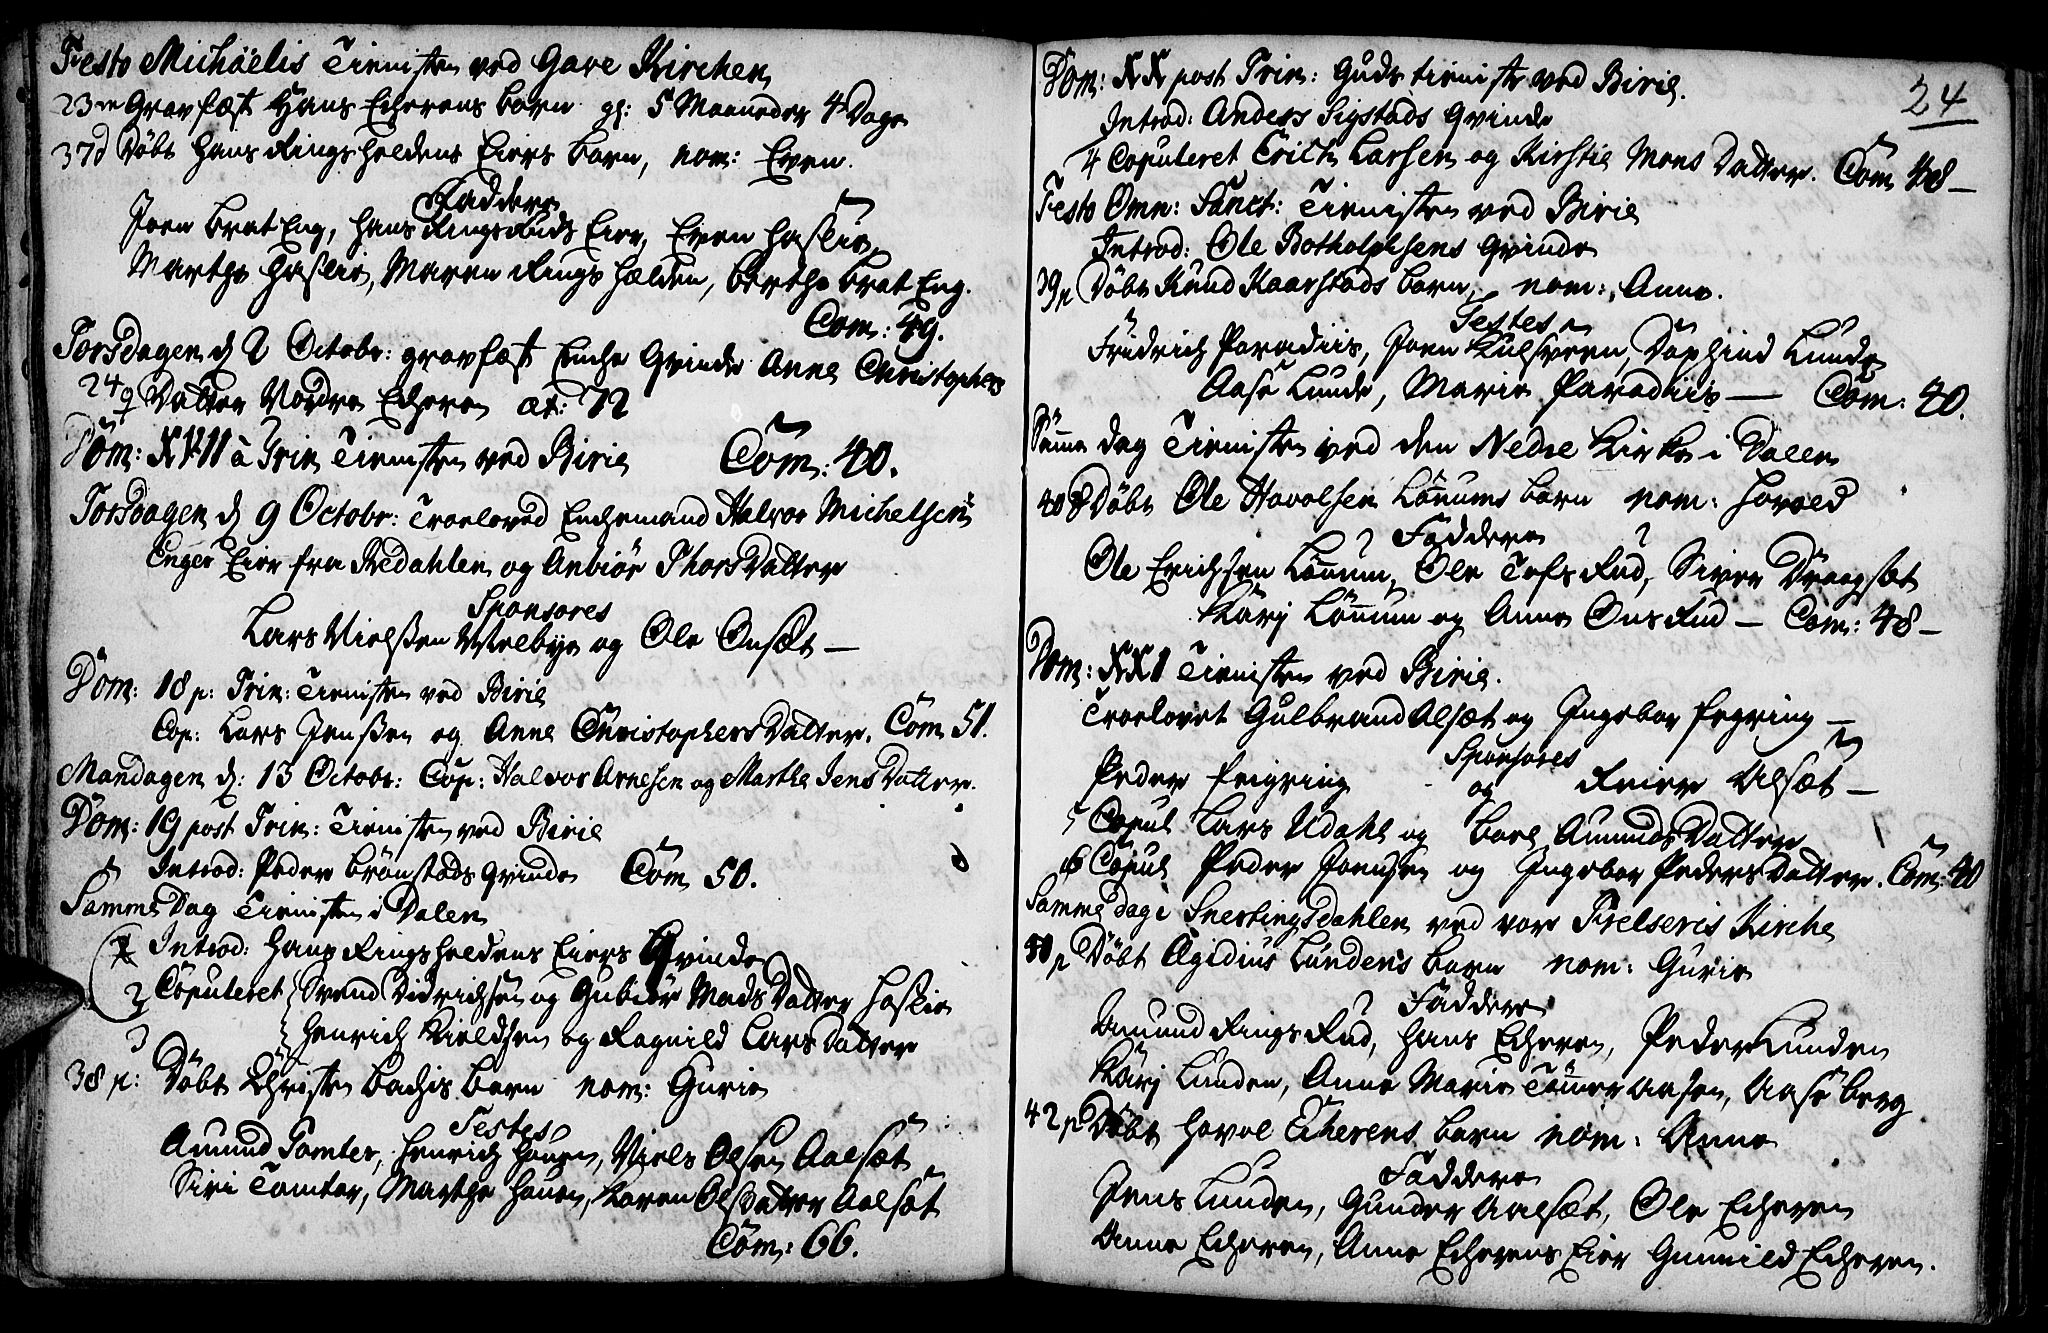 SAH, Biri prestekontor, Parish register (official) no. 1, 1730-1754, p. 24